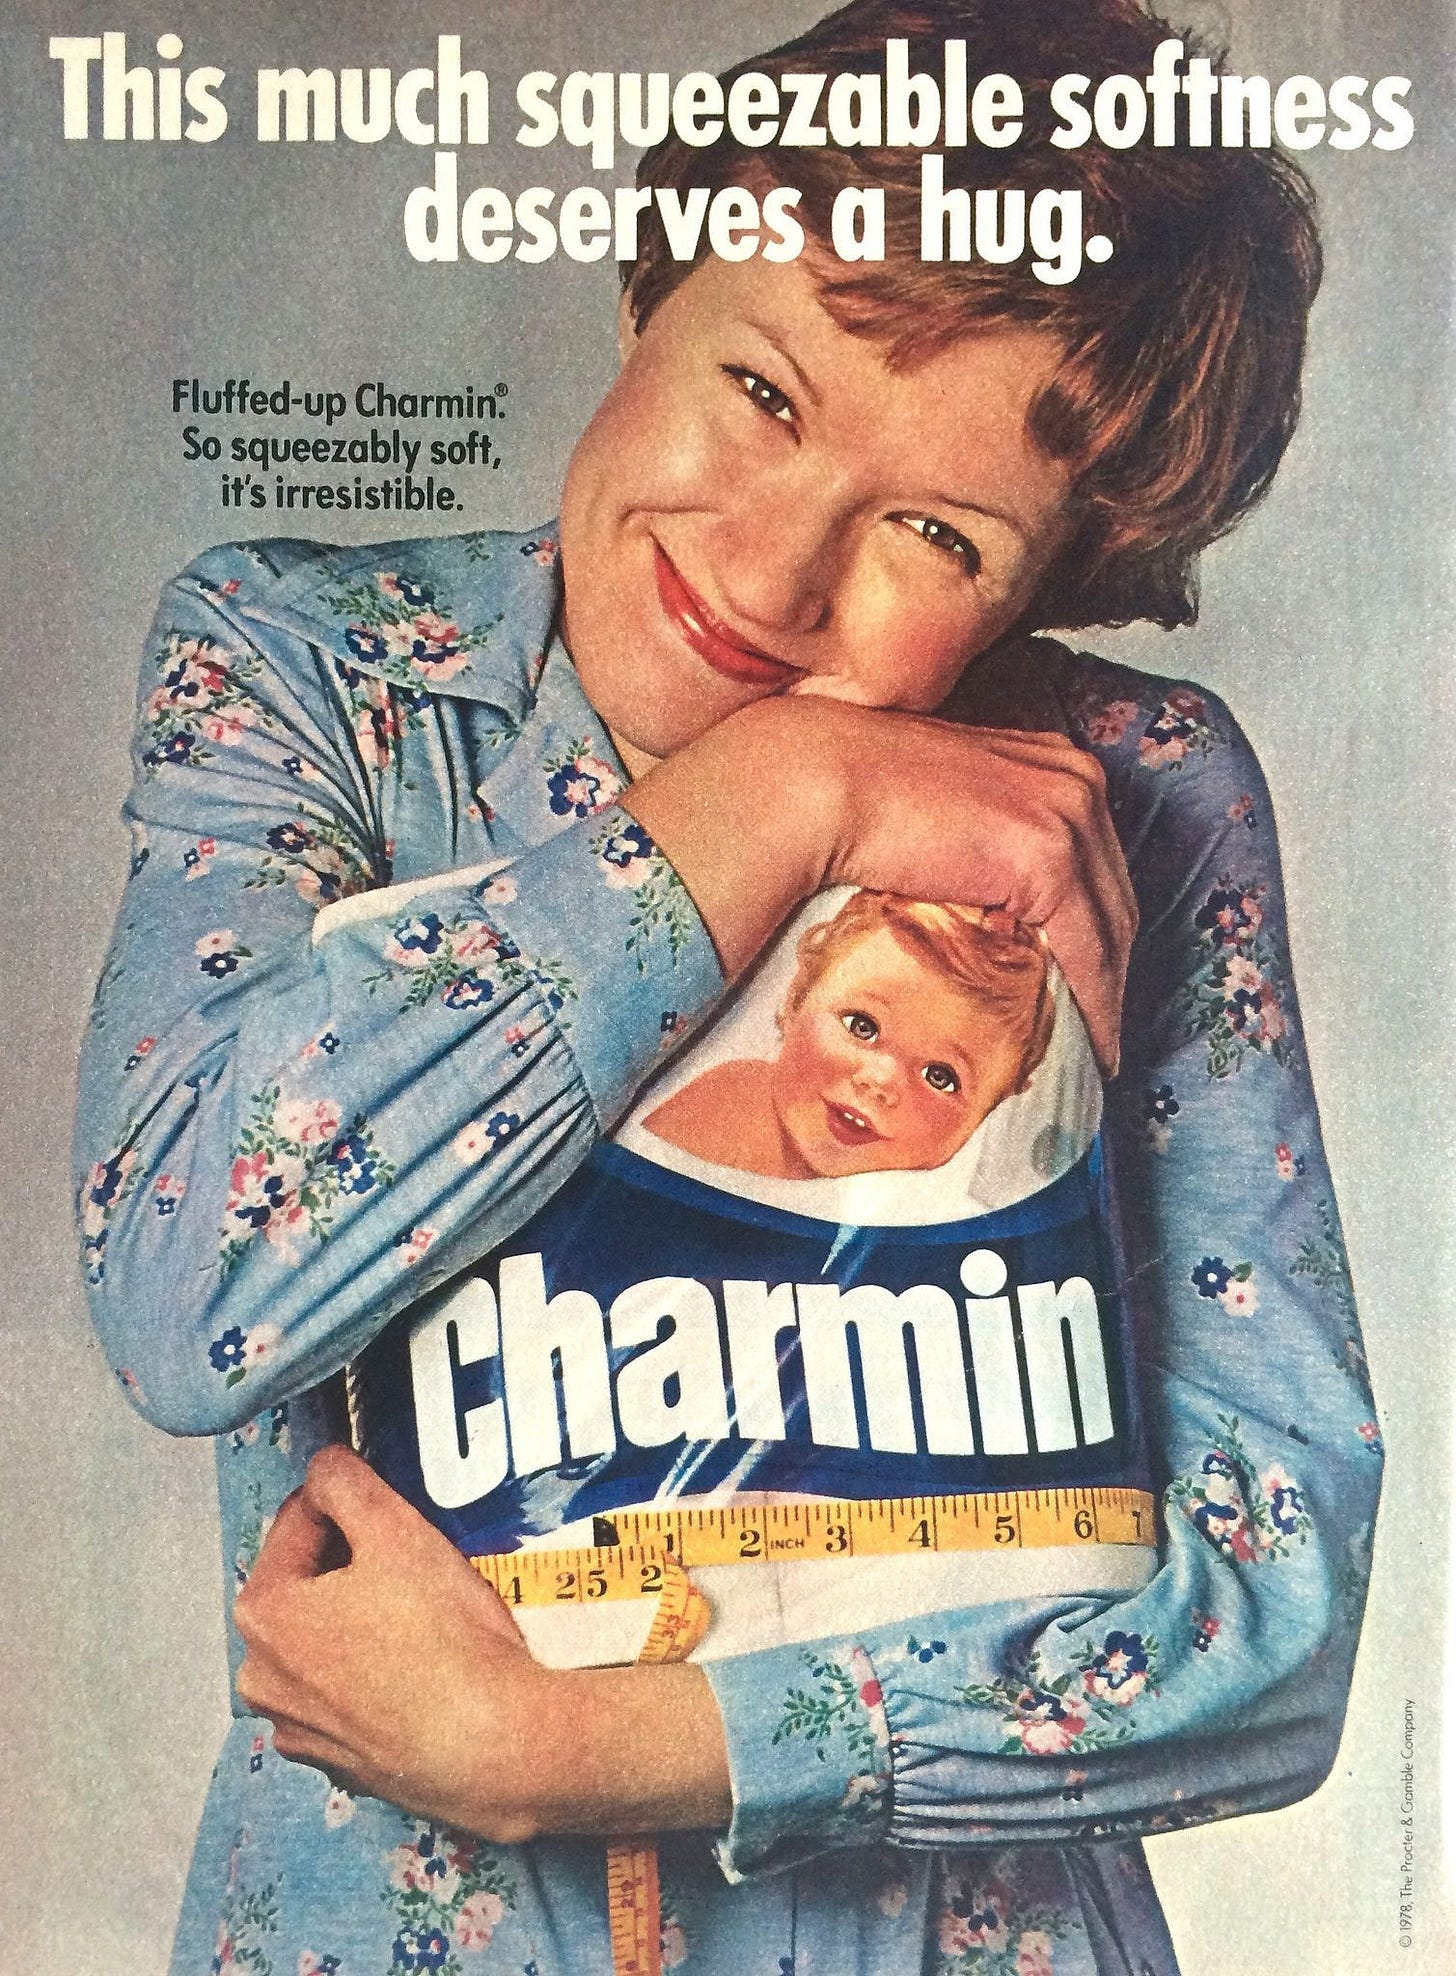 1970s: Charmin | Commercial advertisement, Vintage ads, Fun